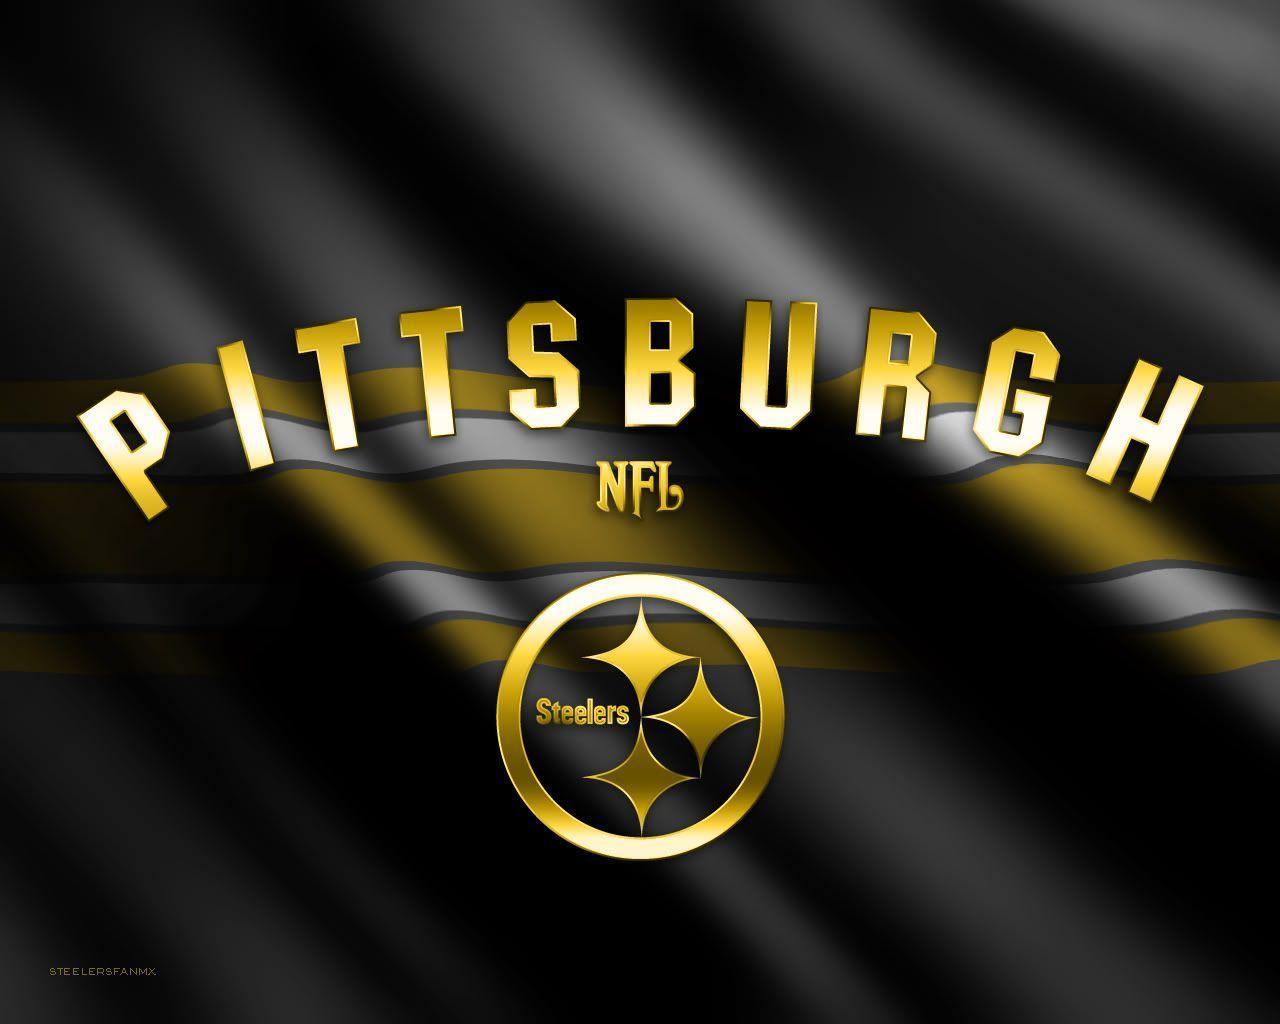 Steelers Wallpapers Schedule Group (69+)